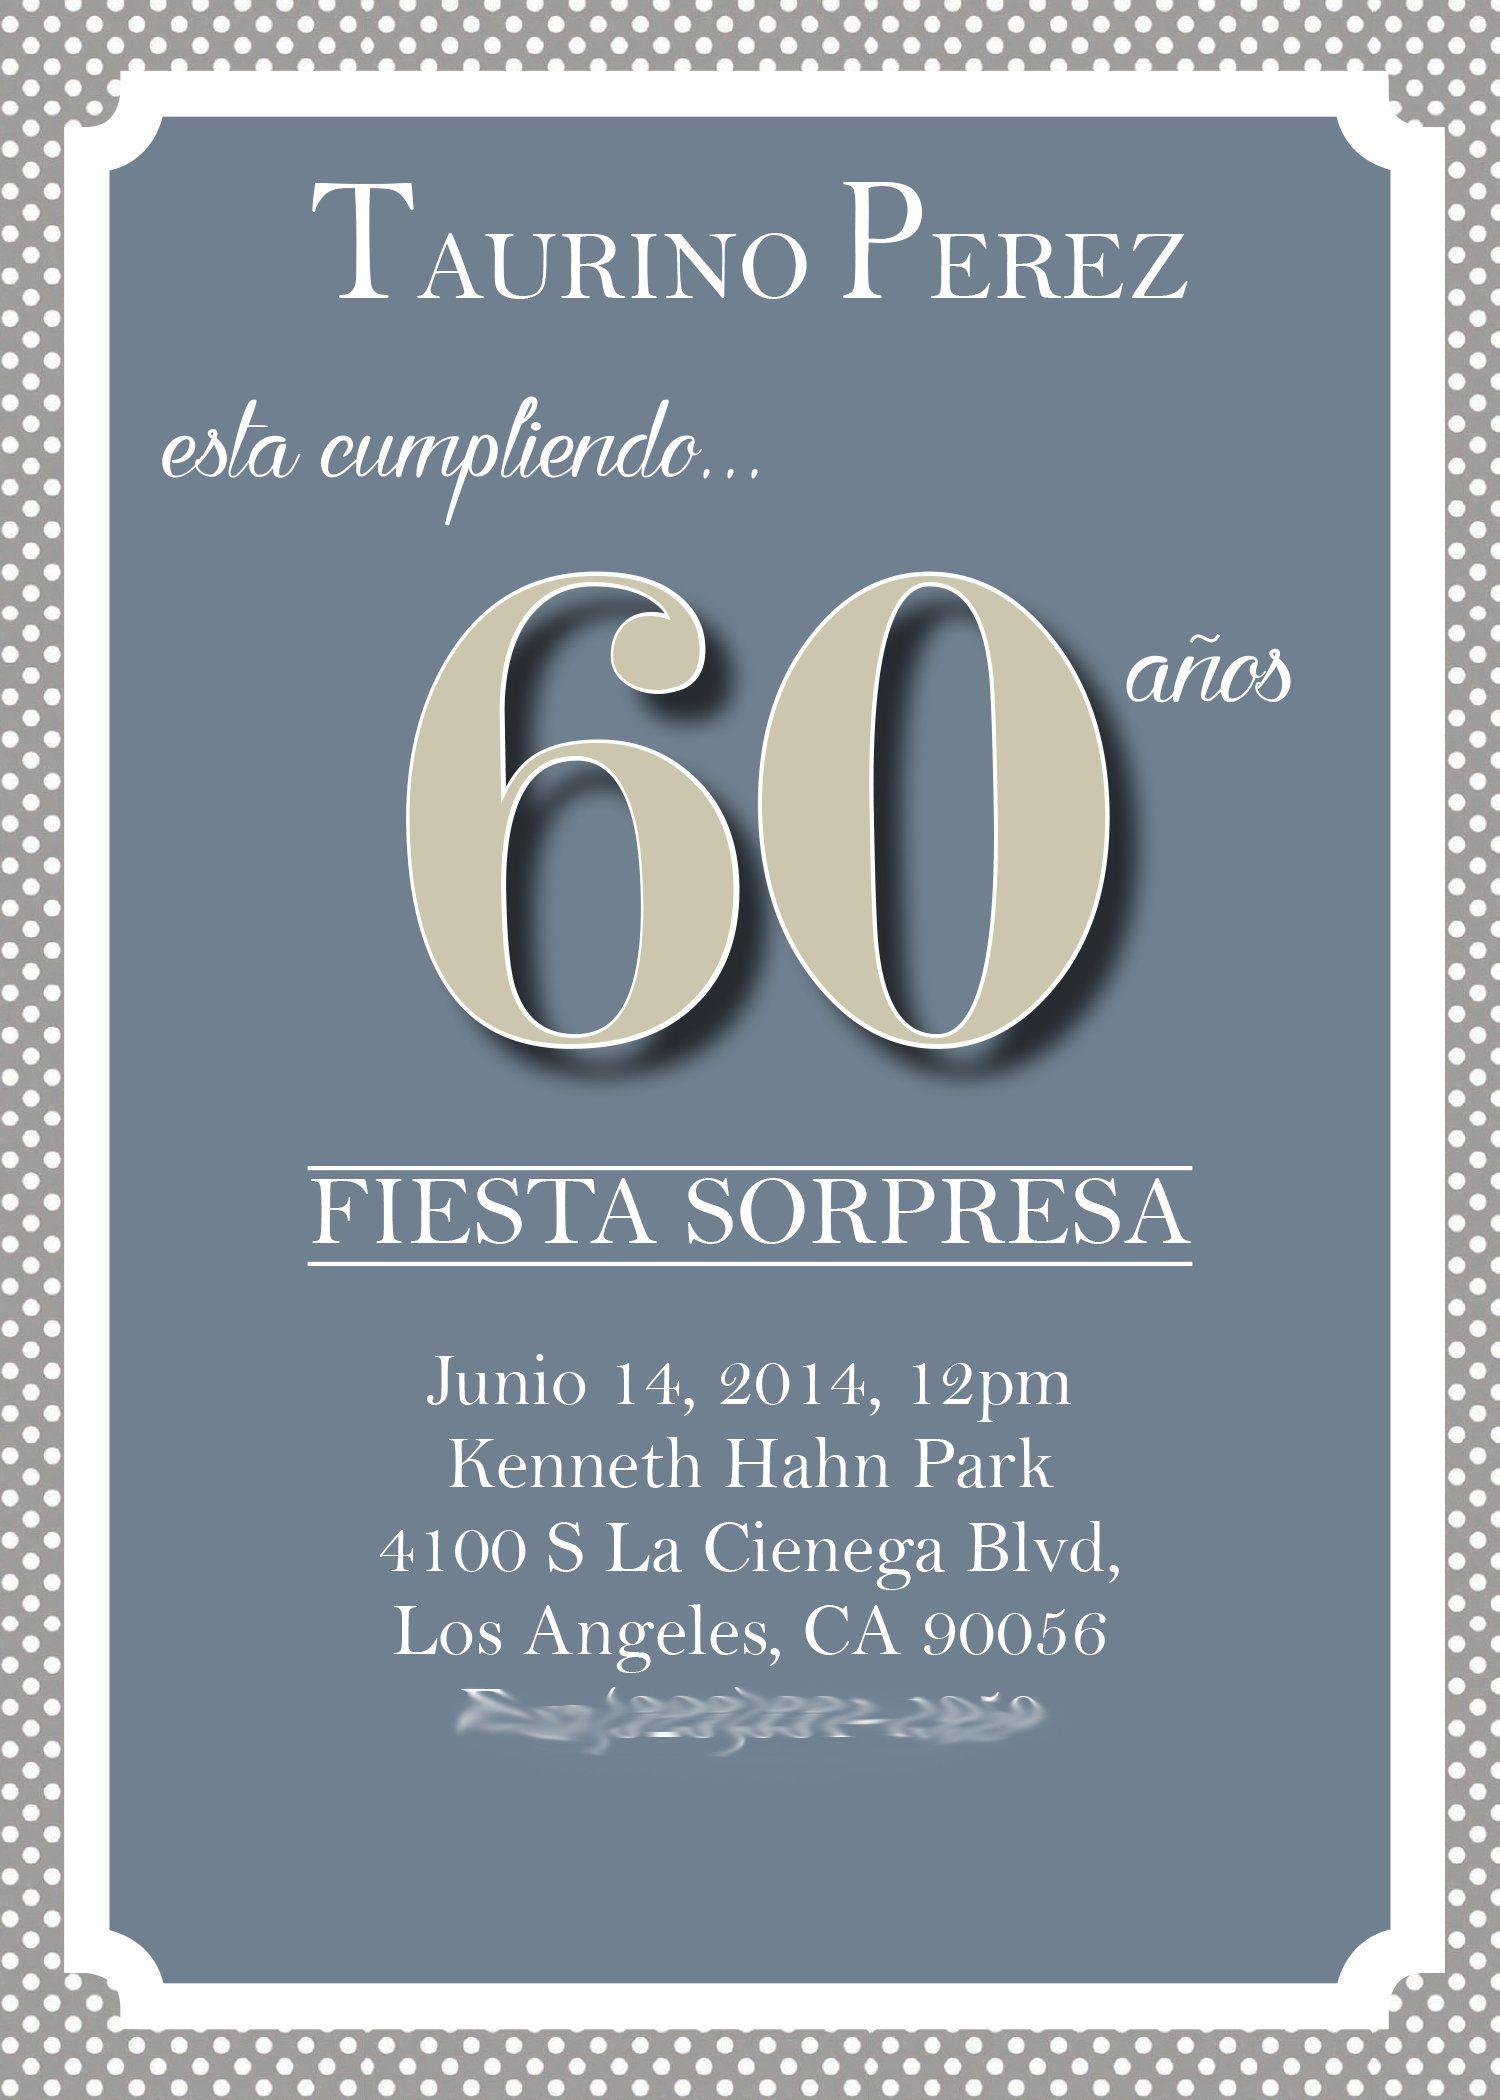 60th birthday invitations online birthday invitations template 60th birthday invitations online filmwisefo Choice Image